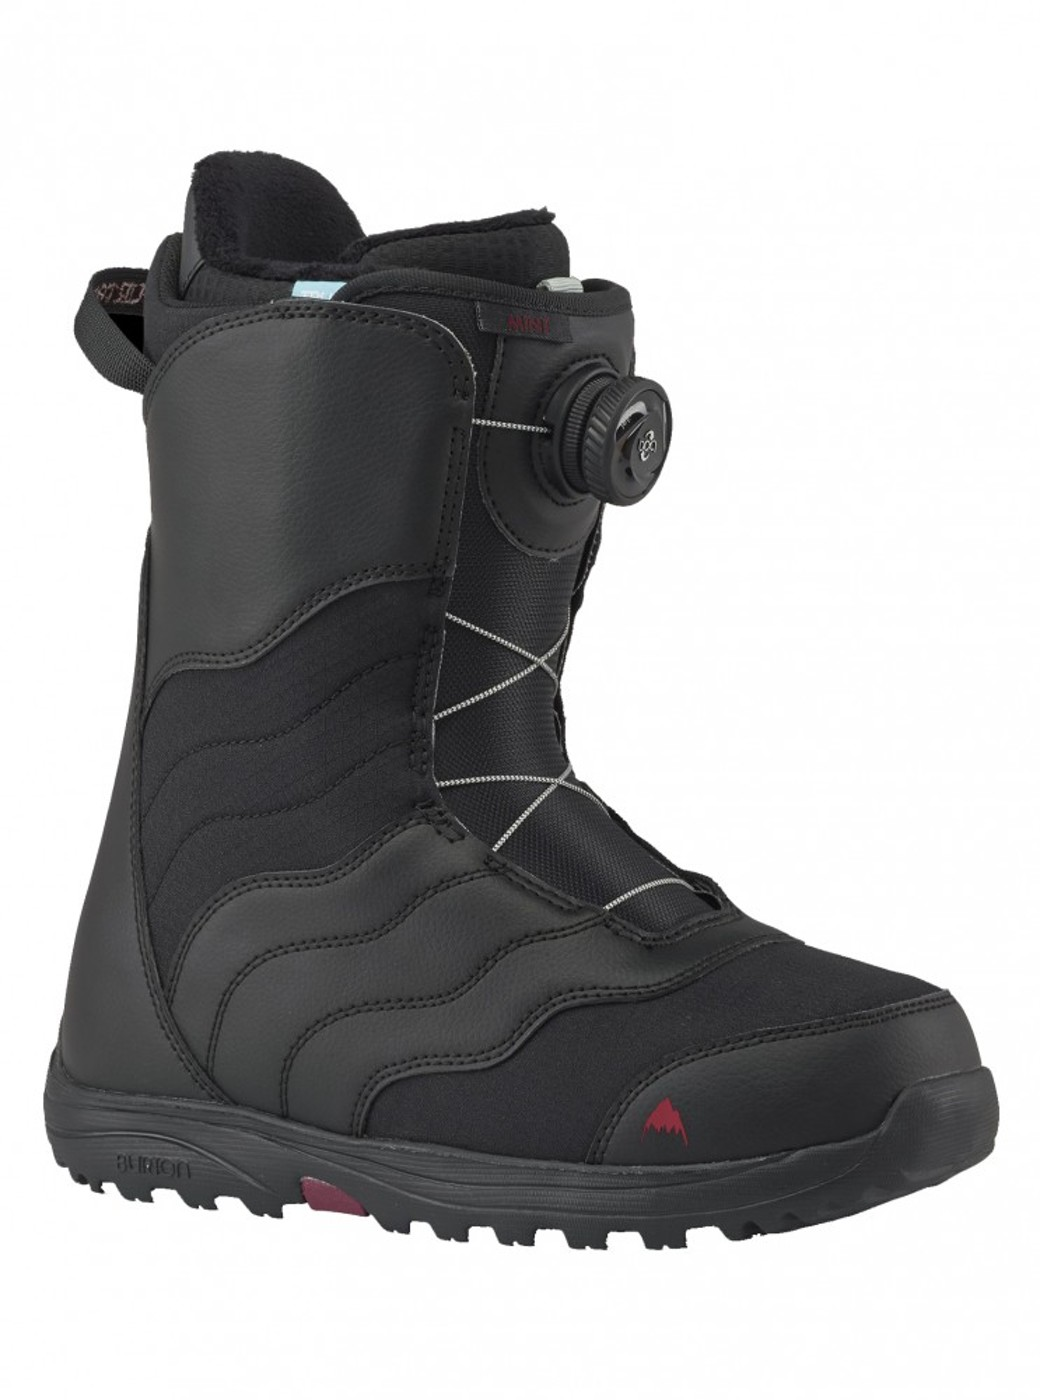 BURTON Snowboard-Boot MINT BOA - Damen